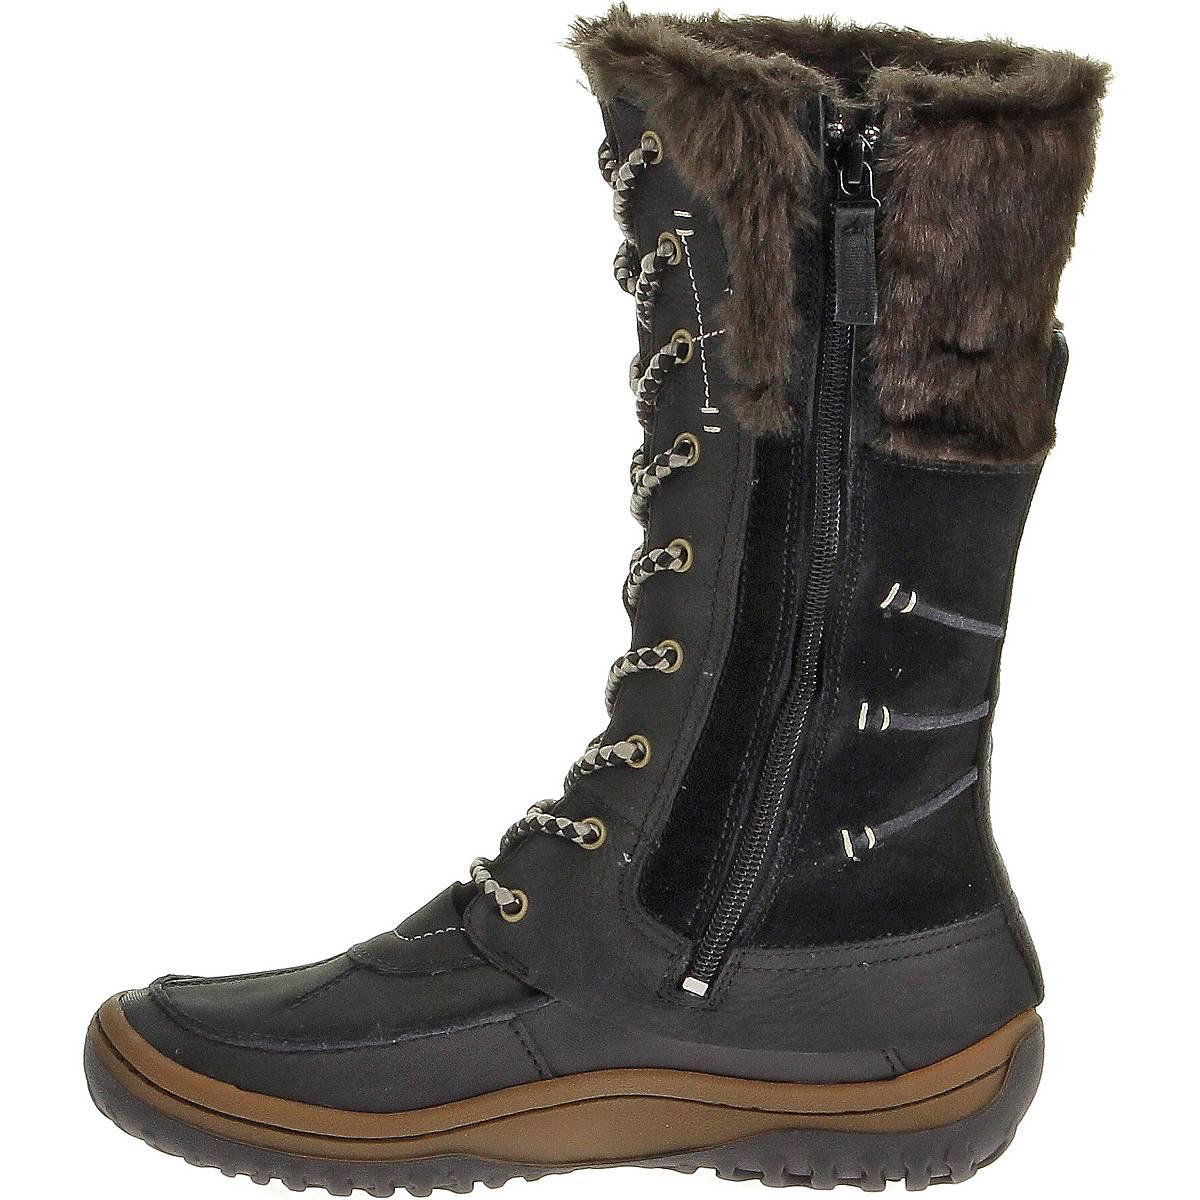 Ski Bike For Sale >> Merrell Decora Prelude Waterproof Boots - Womens